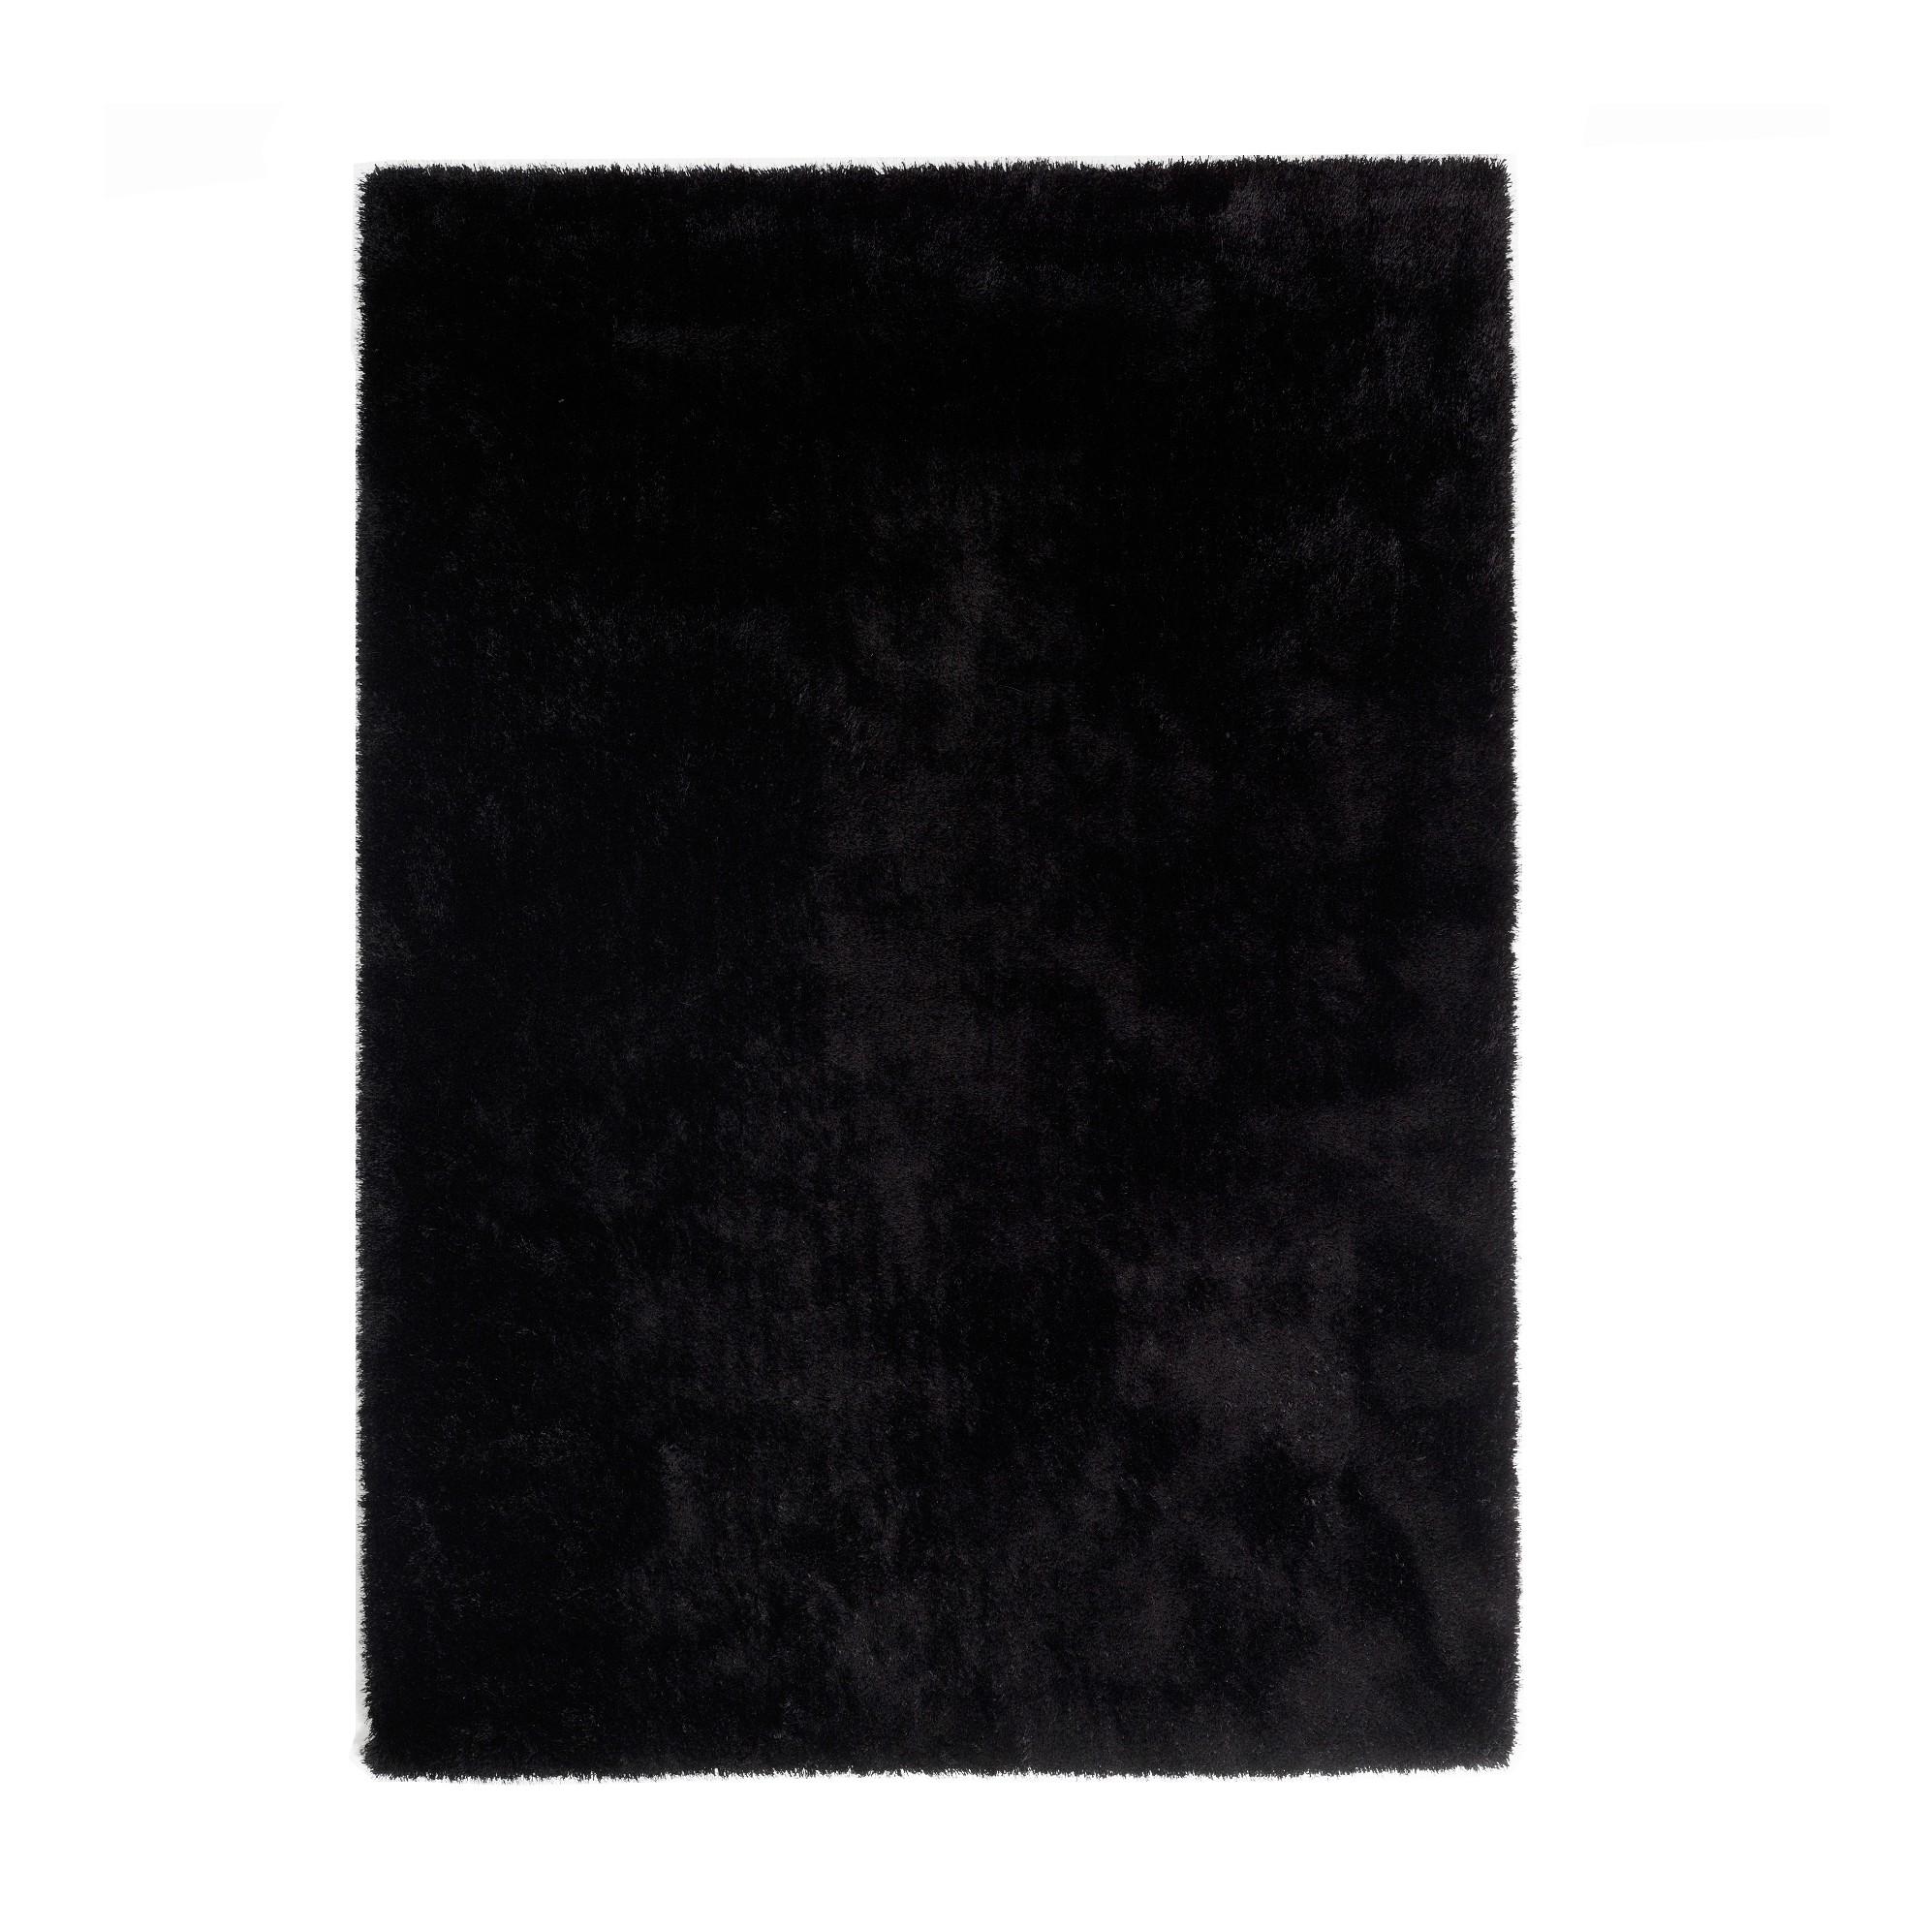 teppich black schwarz 70 x 140 cm colourcourage g nstig. Black Bedroom Furniture Sets. Home Design Ideas